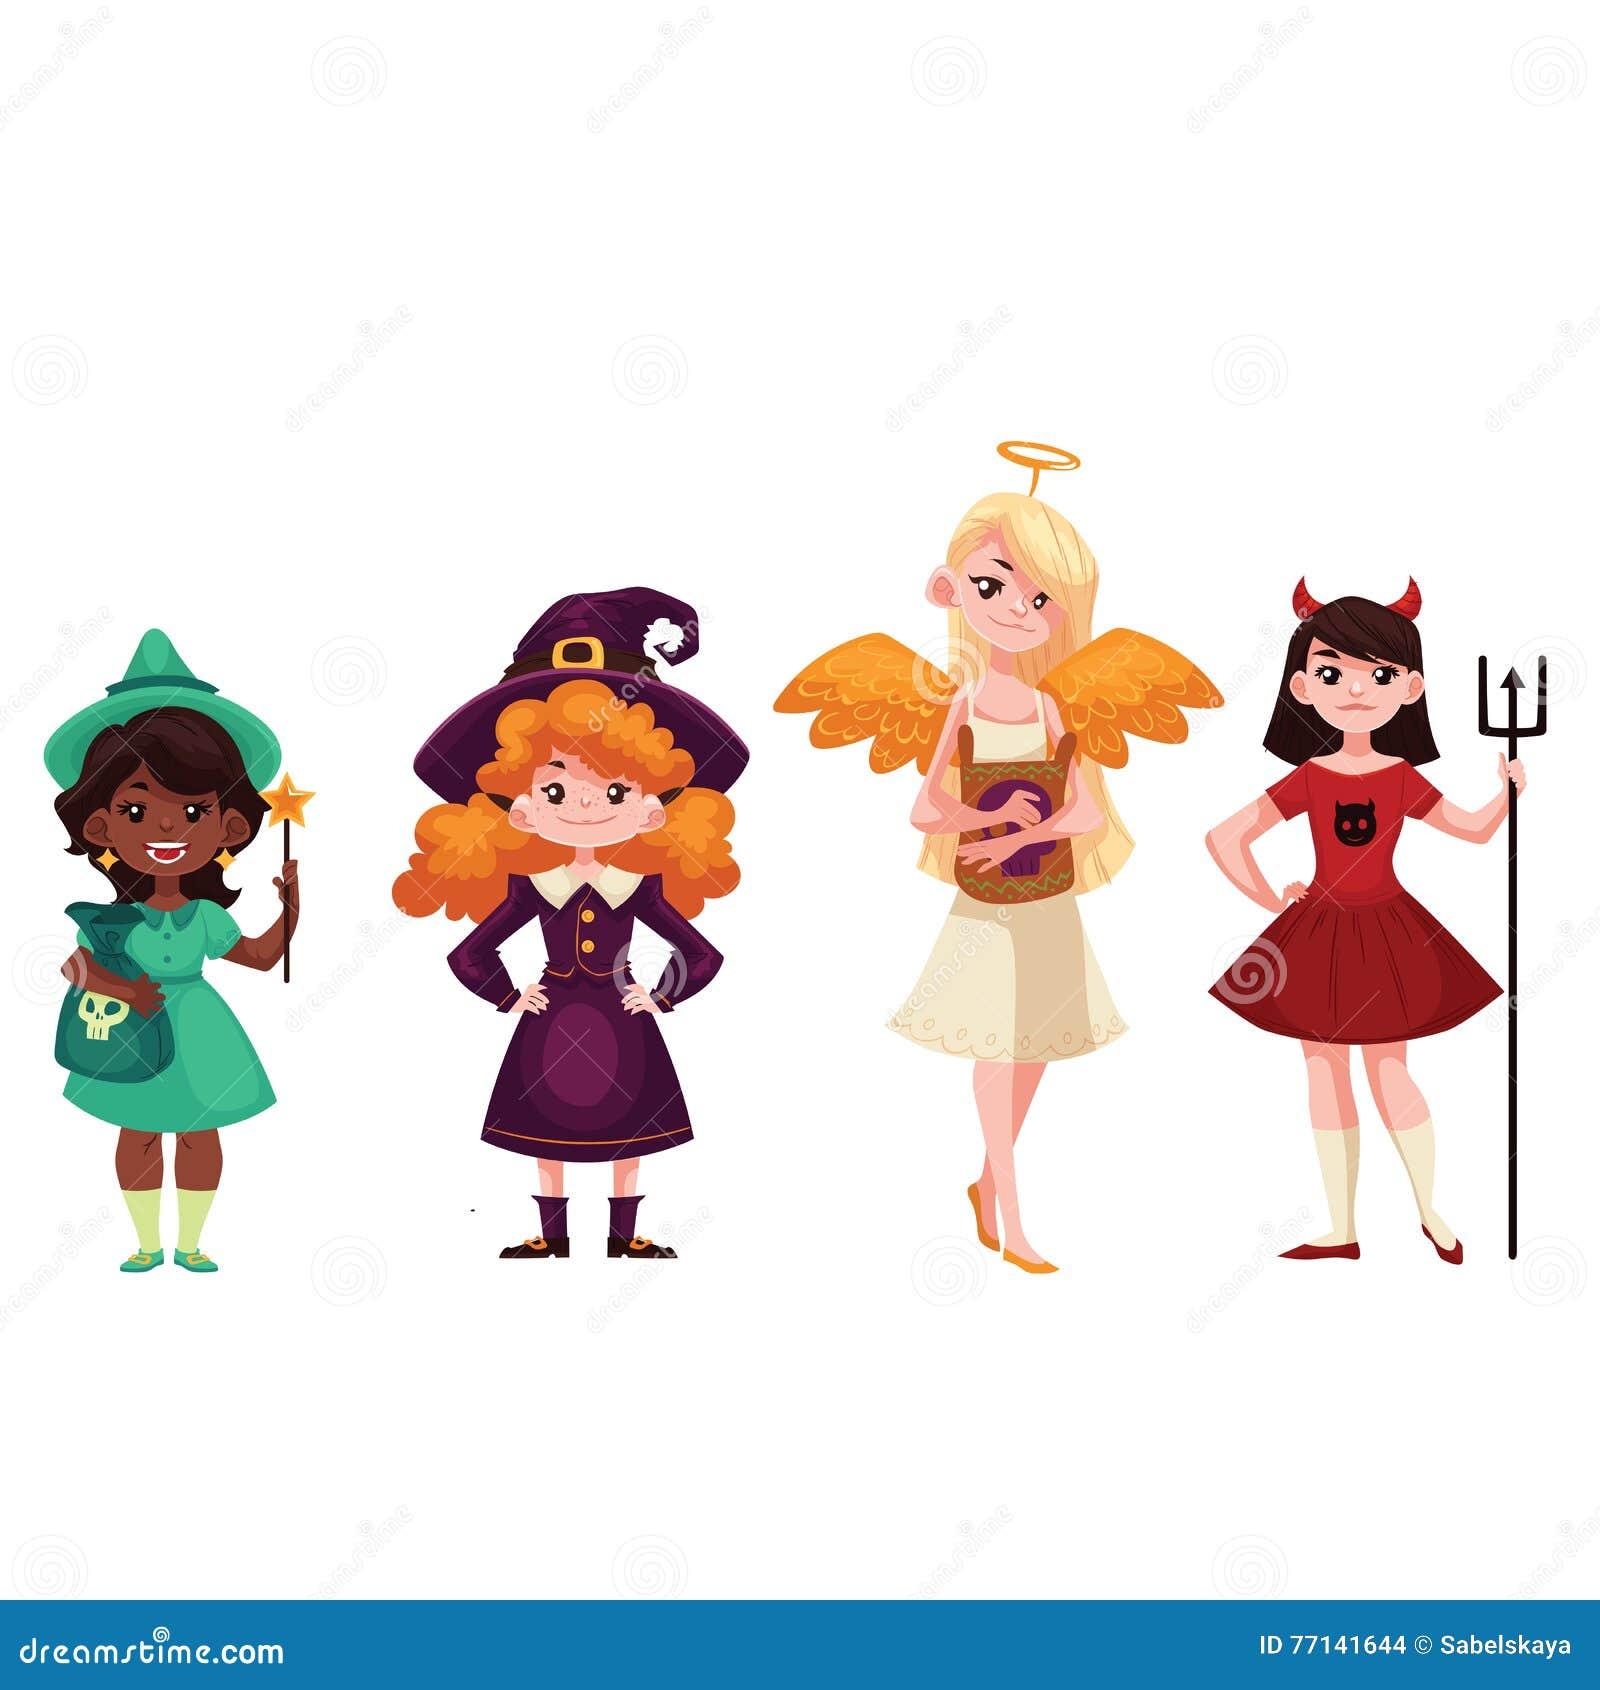 Girls dressed in Witch angel demon leprechaun costumes for Halloween